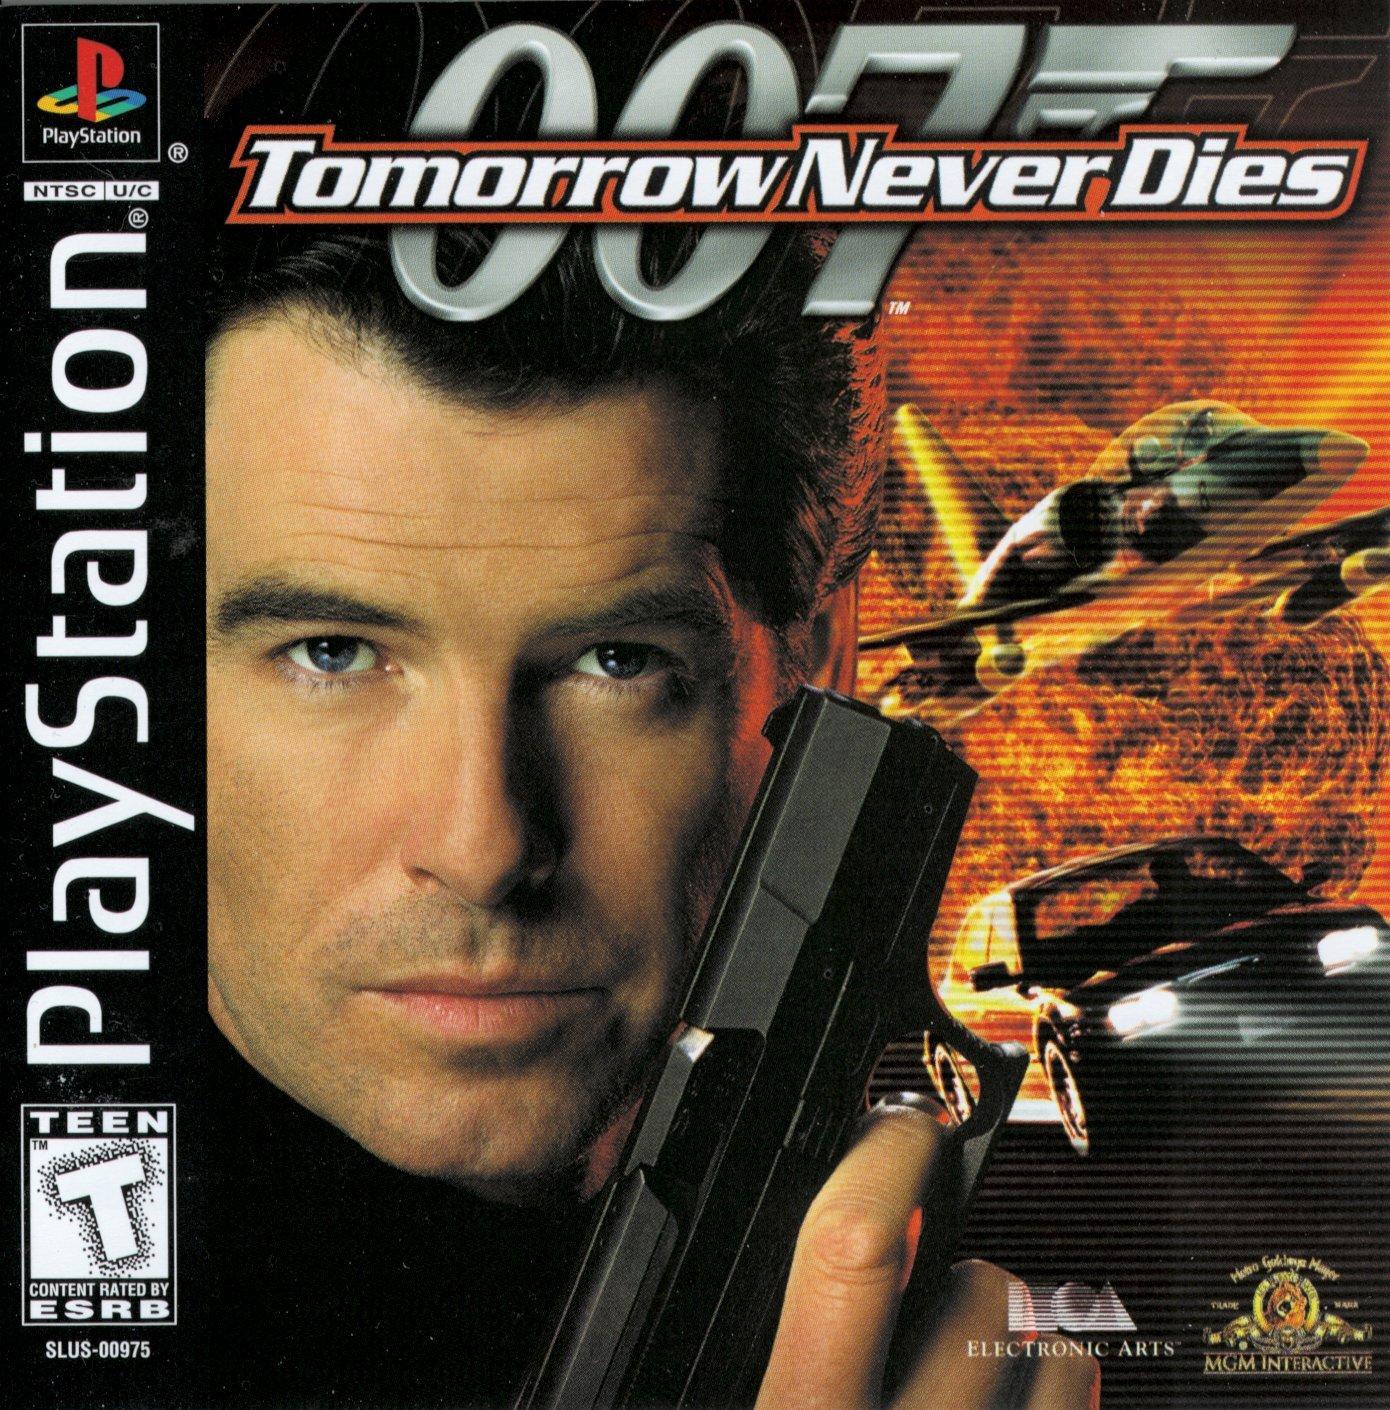 007 Tomorrow Never Dies (wersja niem.) okładka